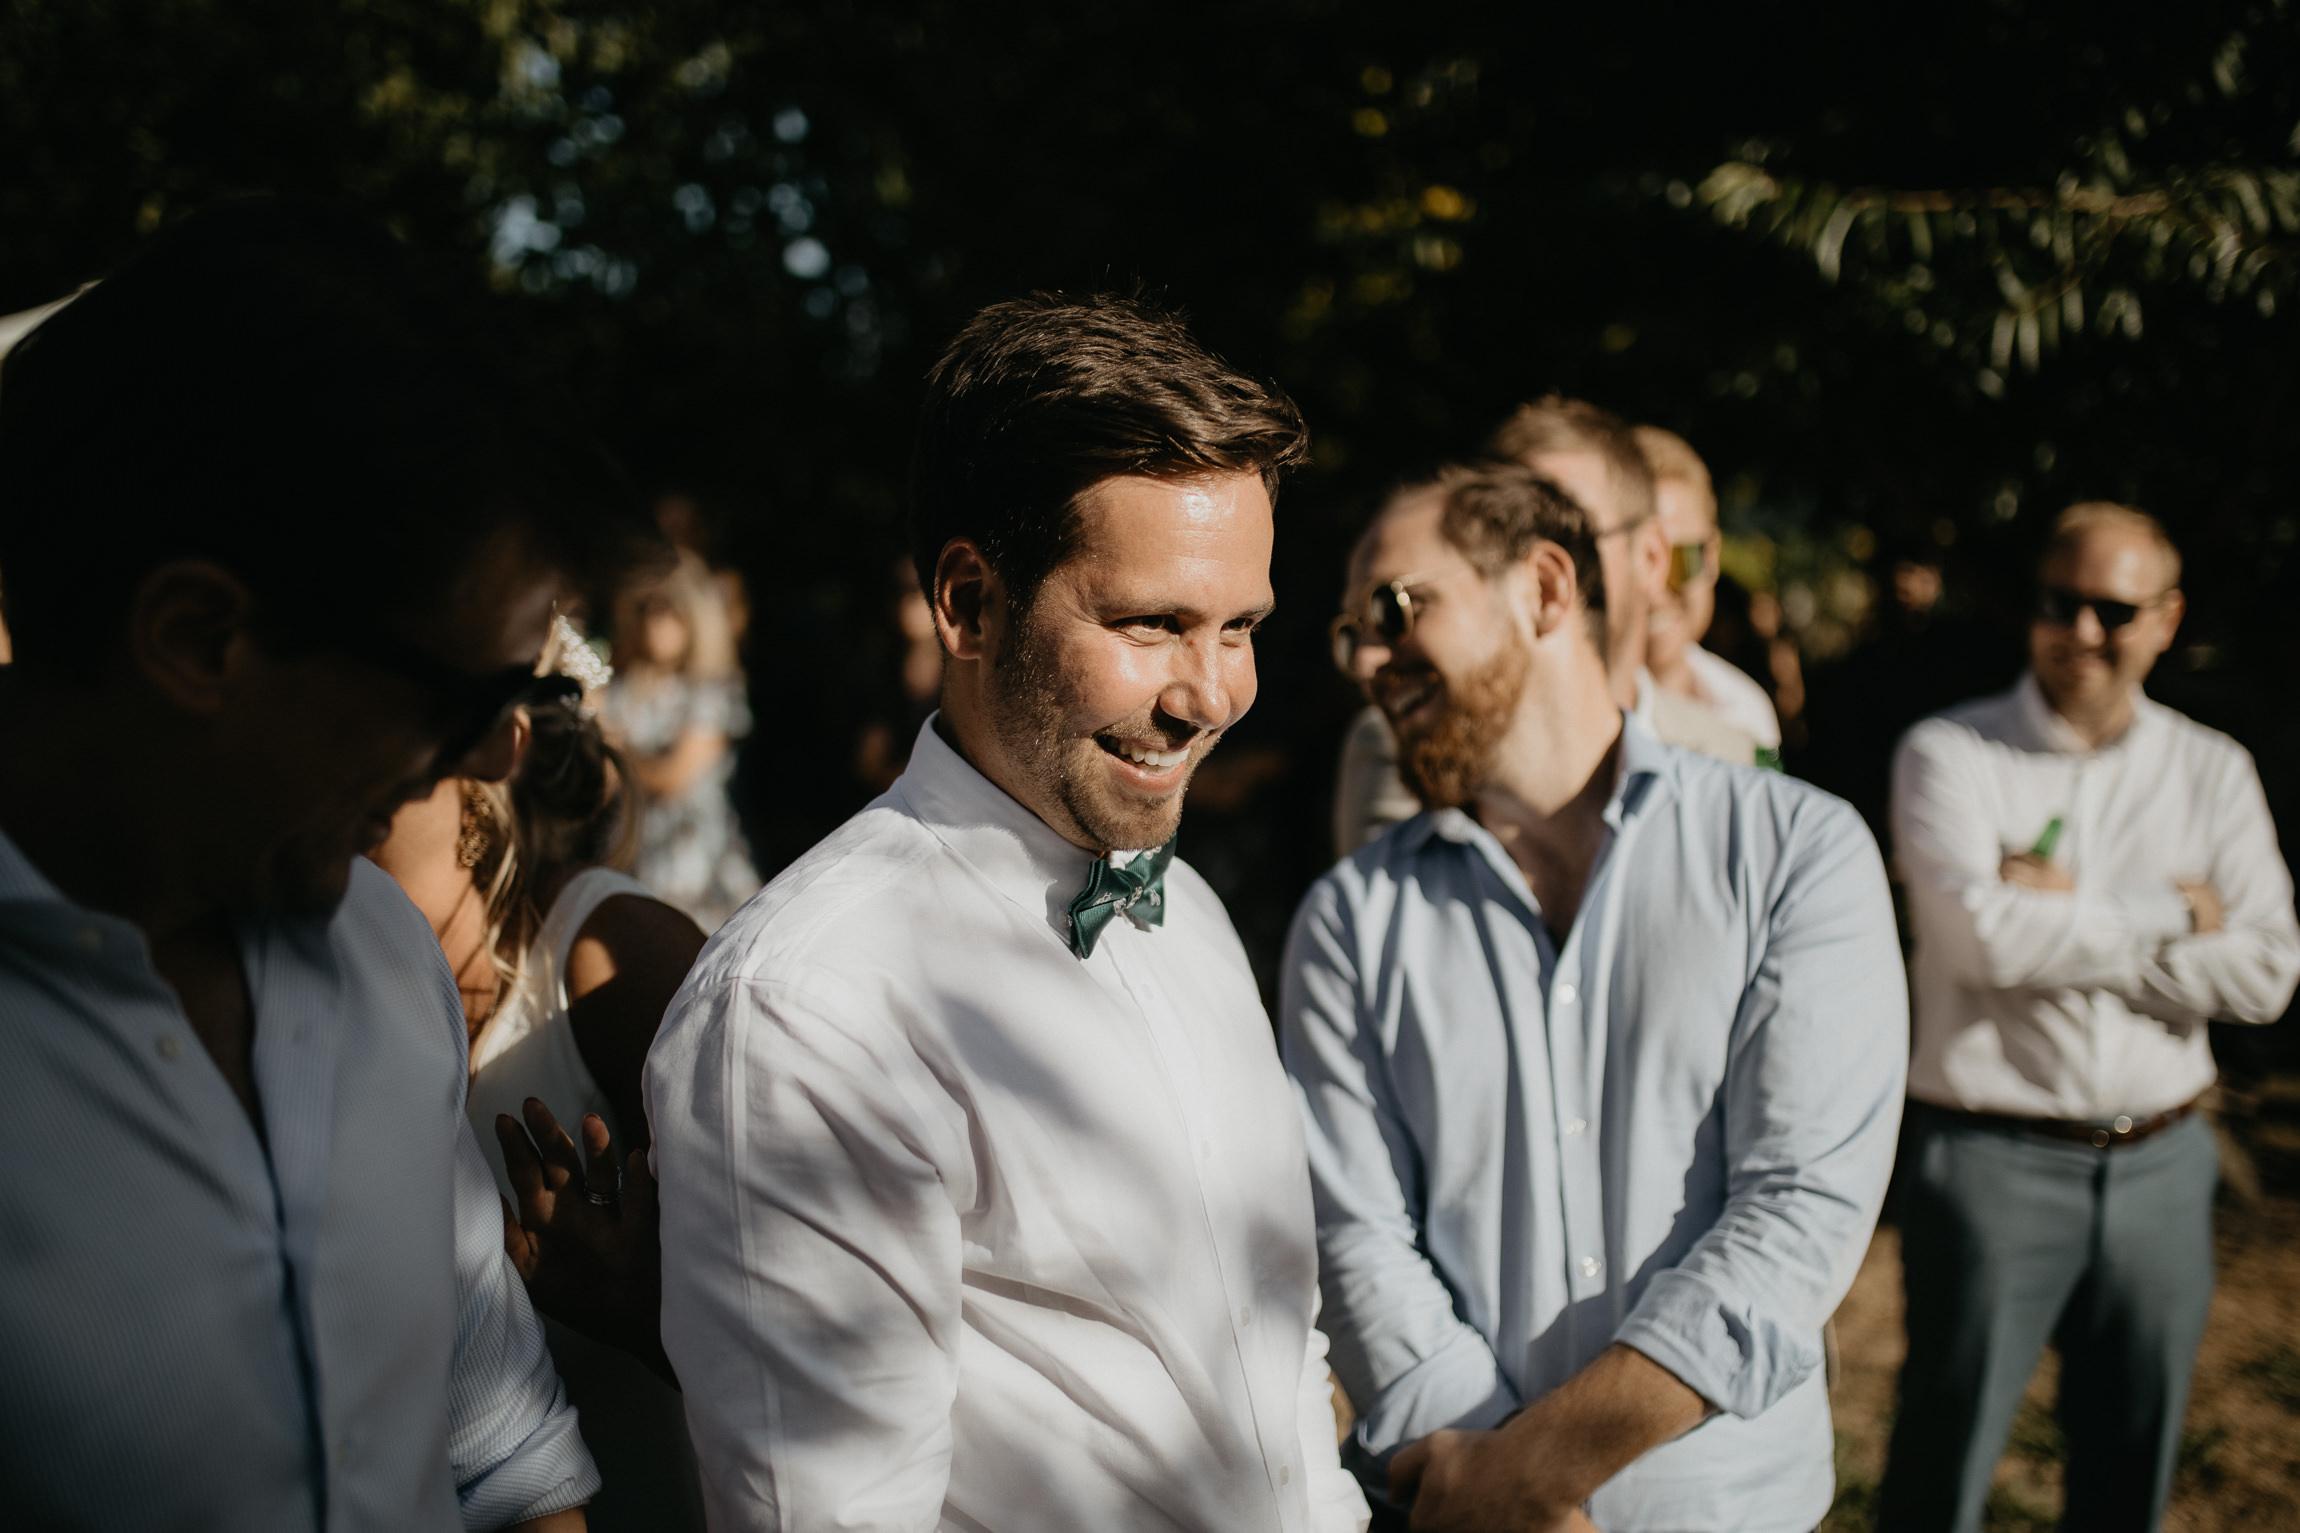 oldforestschool-wedding-blog-141.jpg